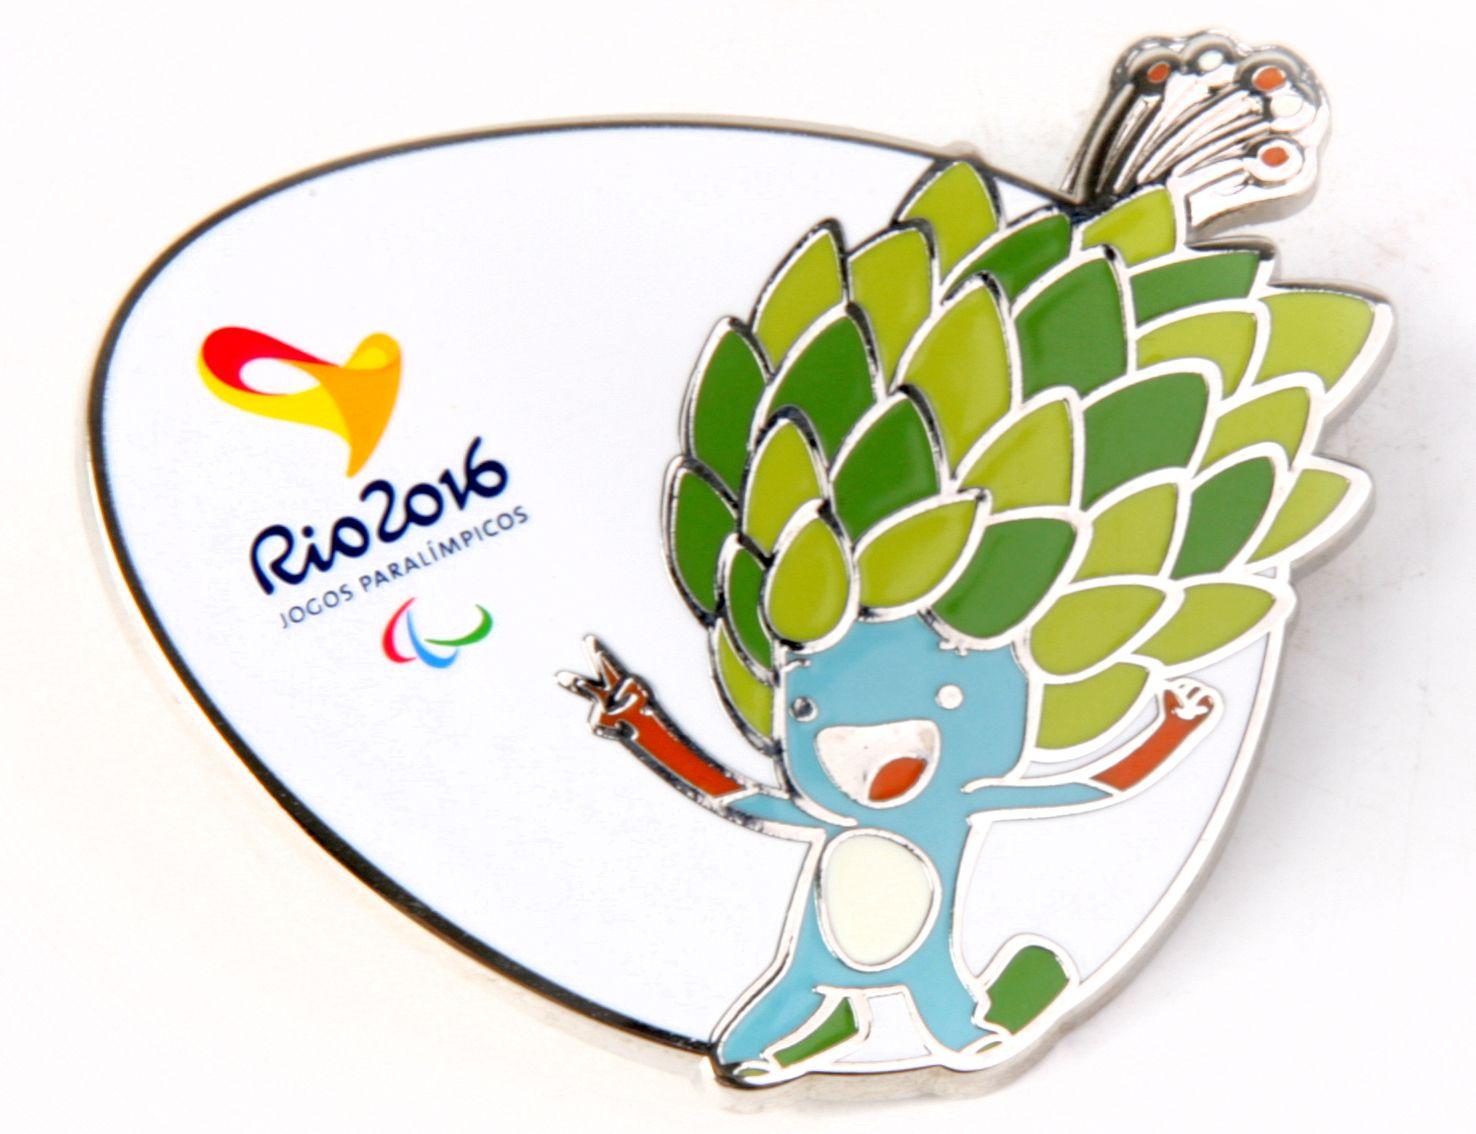 Pin Do Mascote Paralimpico Rio2016 Tom Jogos Olimpicos